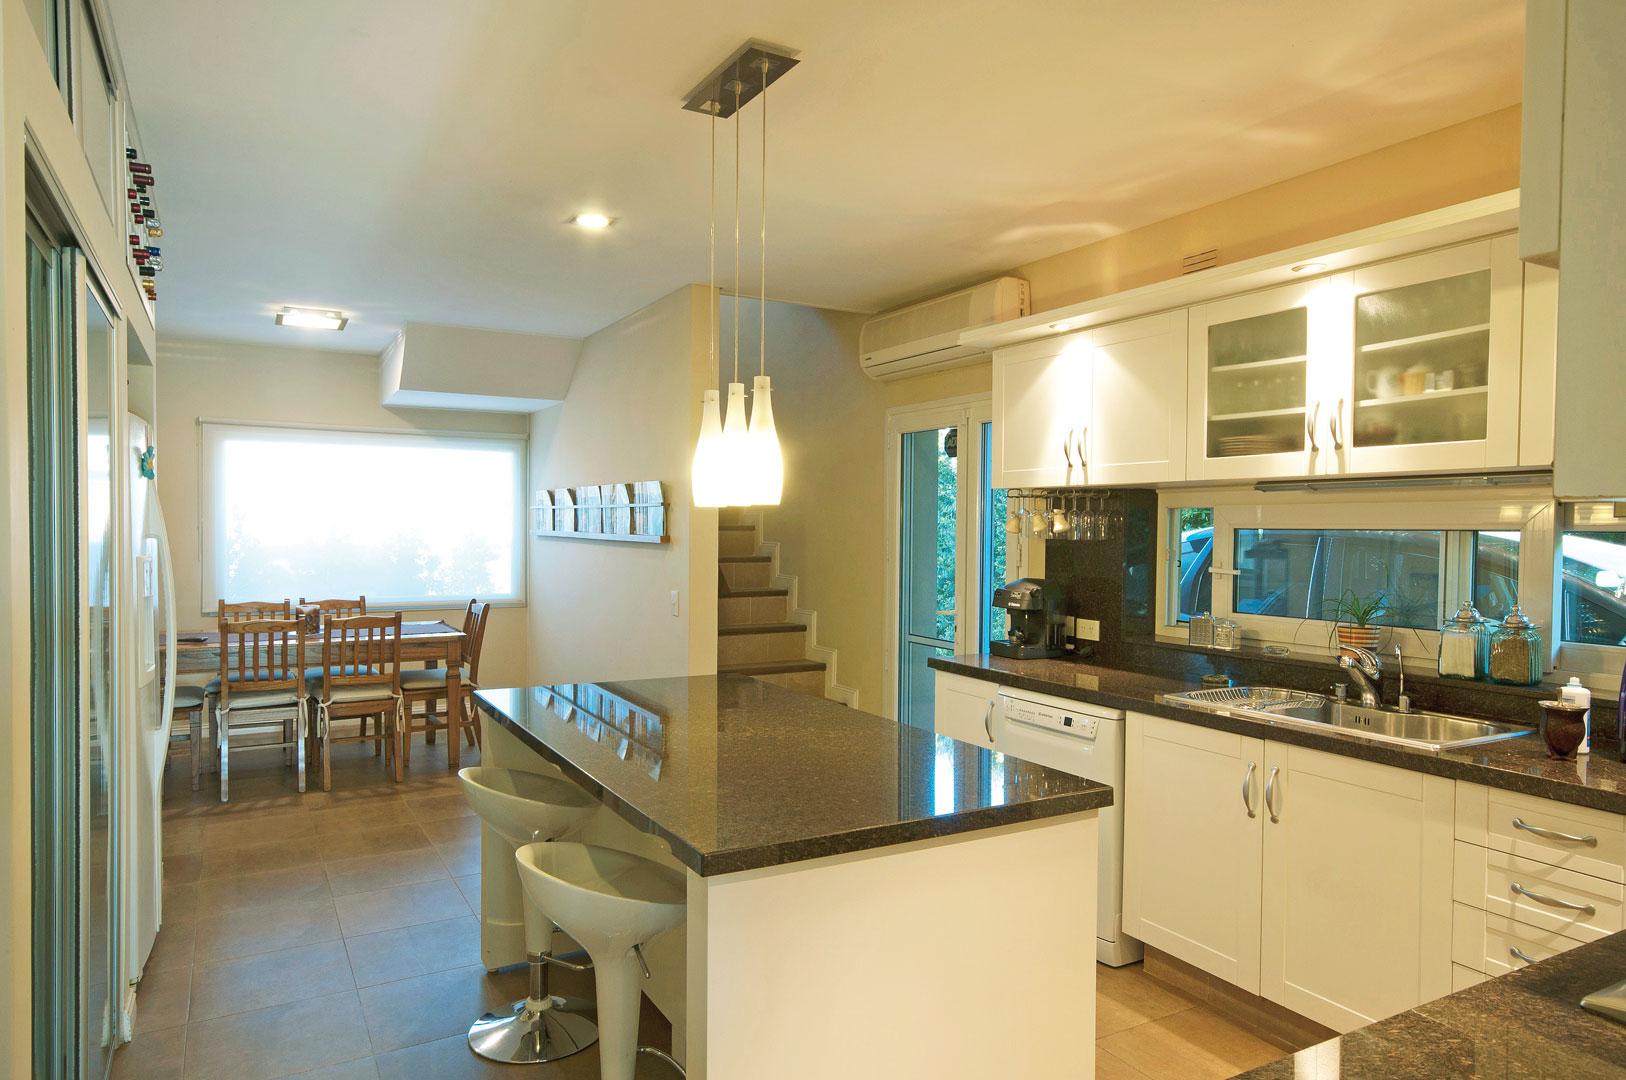 Estudio clari arquitectura casa estilo actual portal - Estudio de arquitectos ...